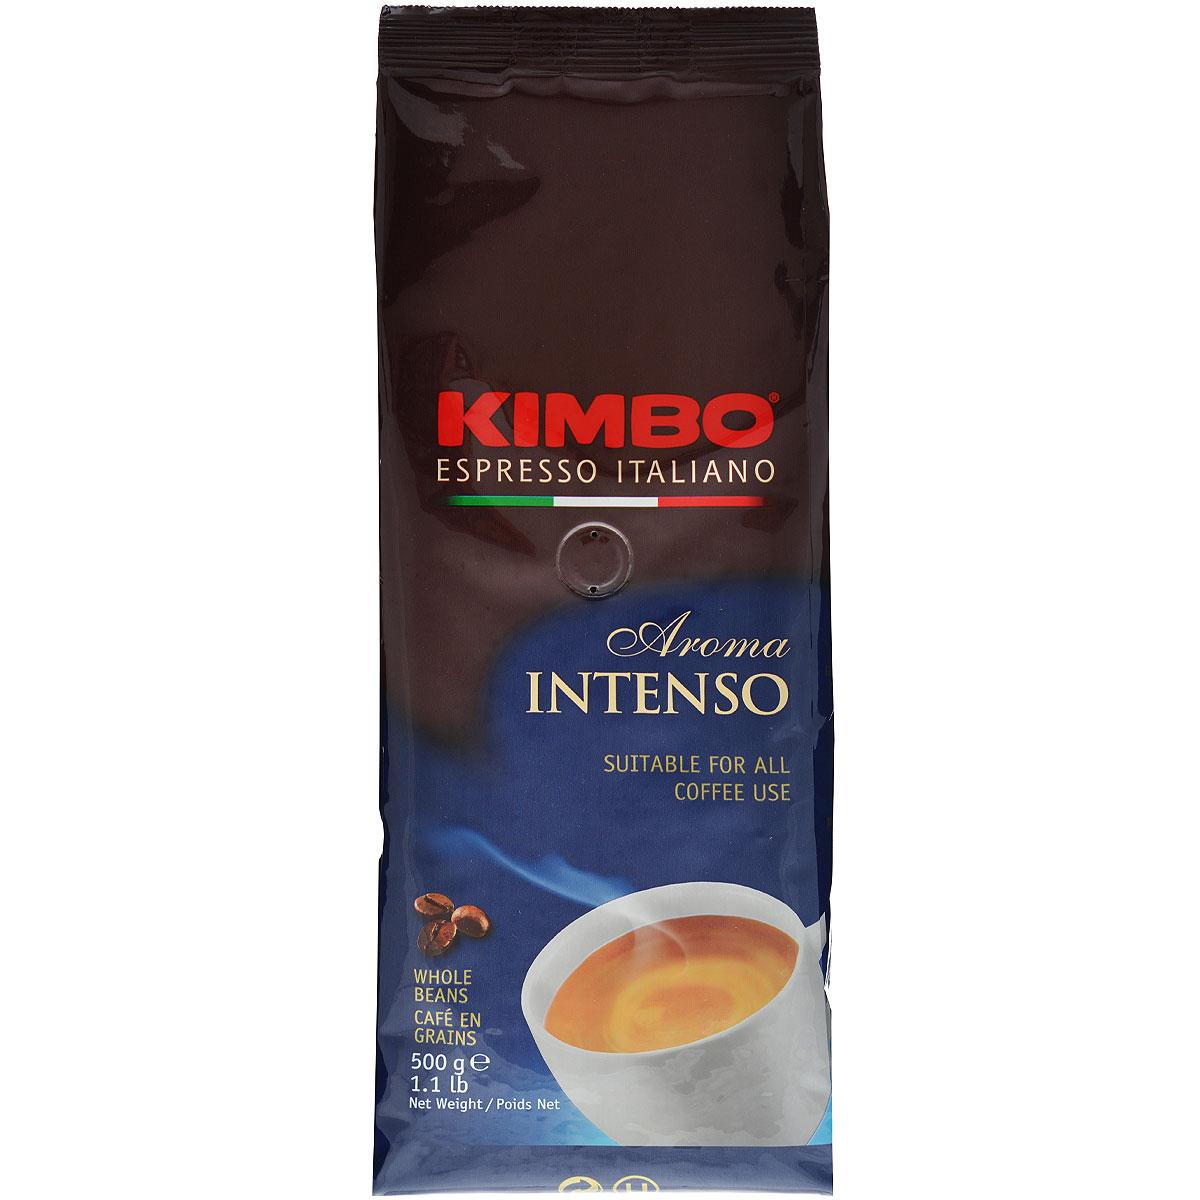 Kimbo Aroma Intenso кофе в зернах, 500 г8002200601225